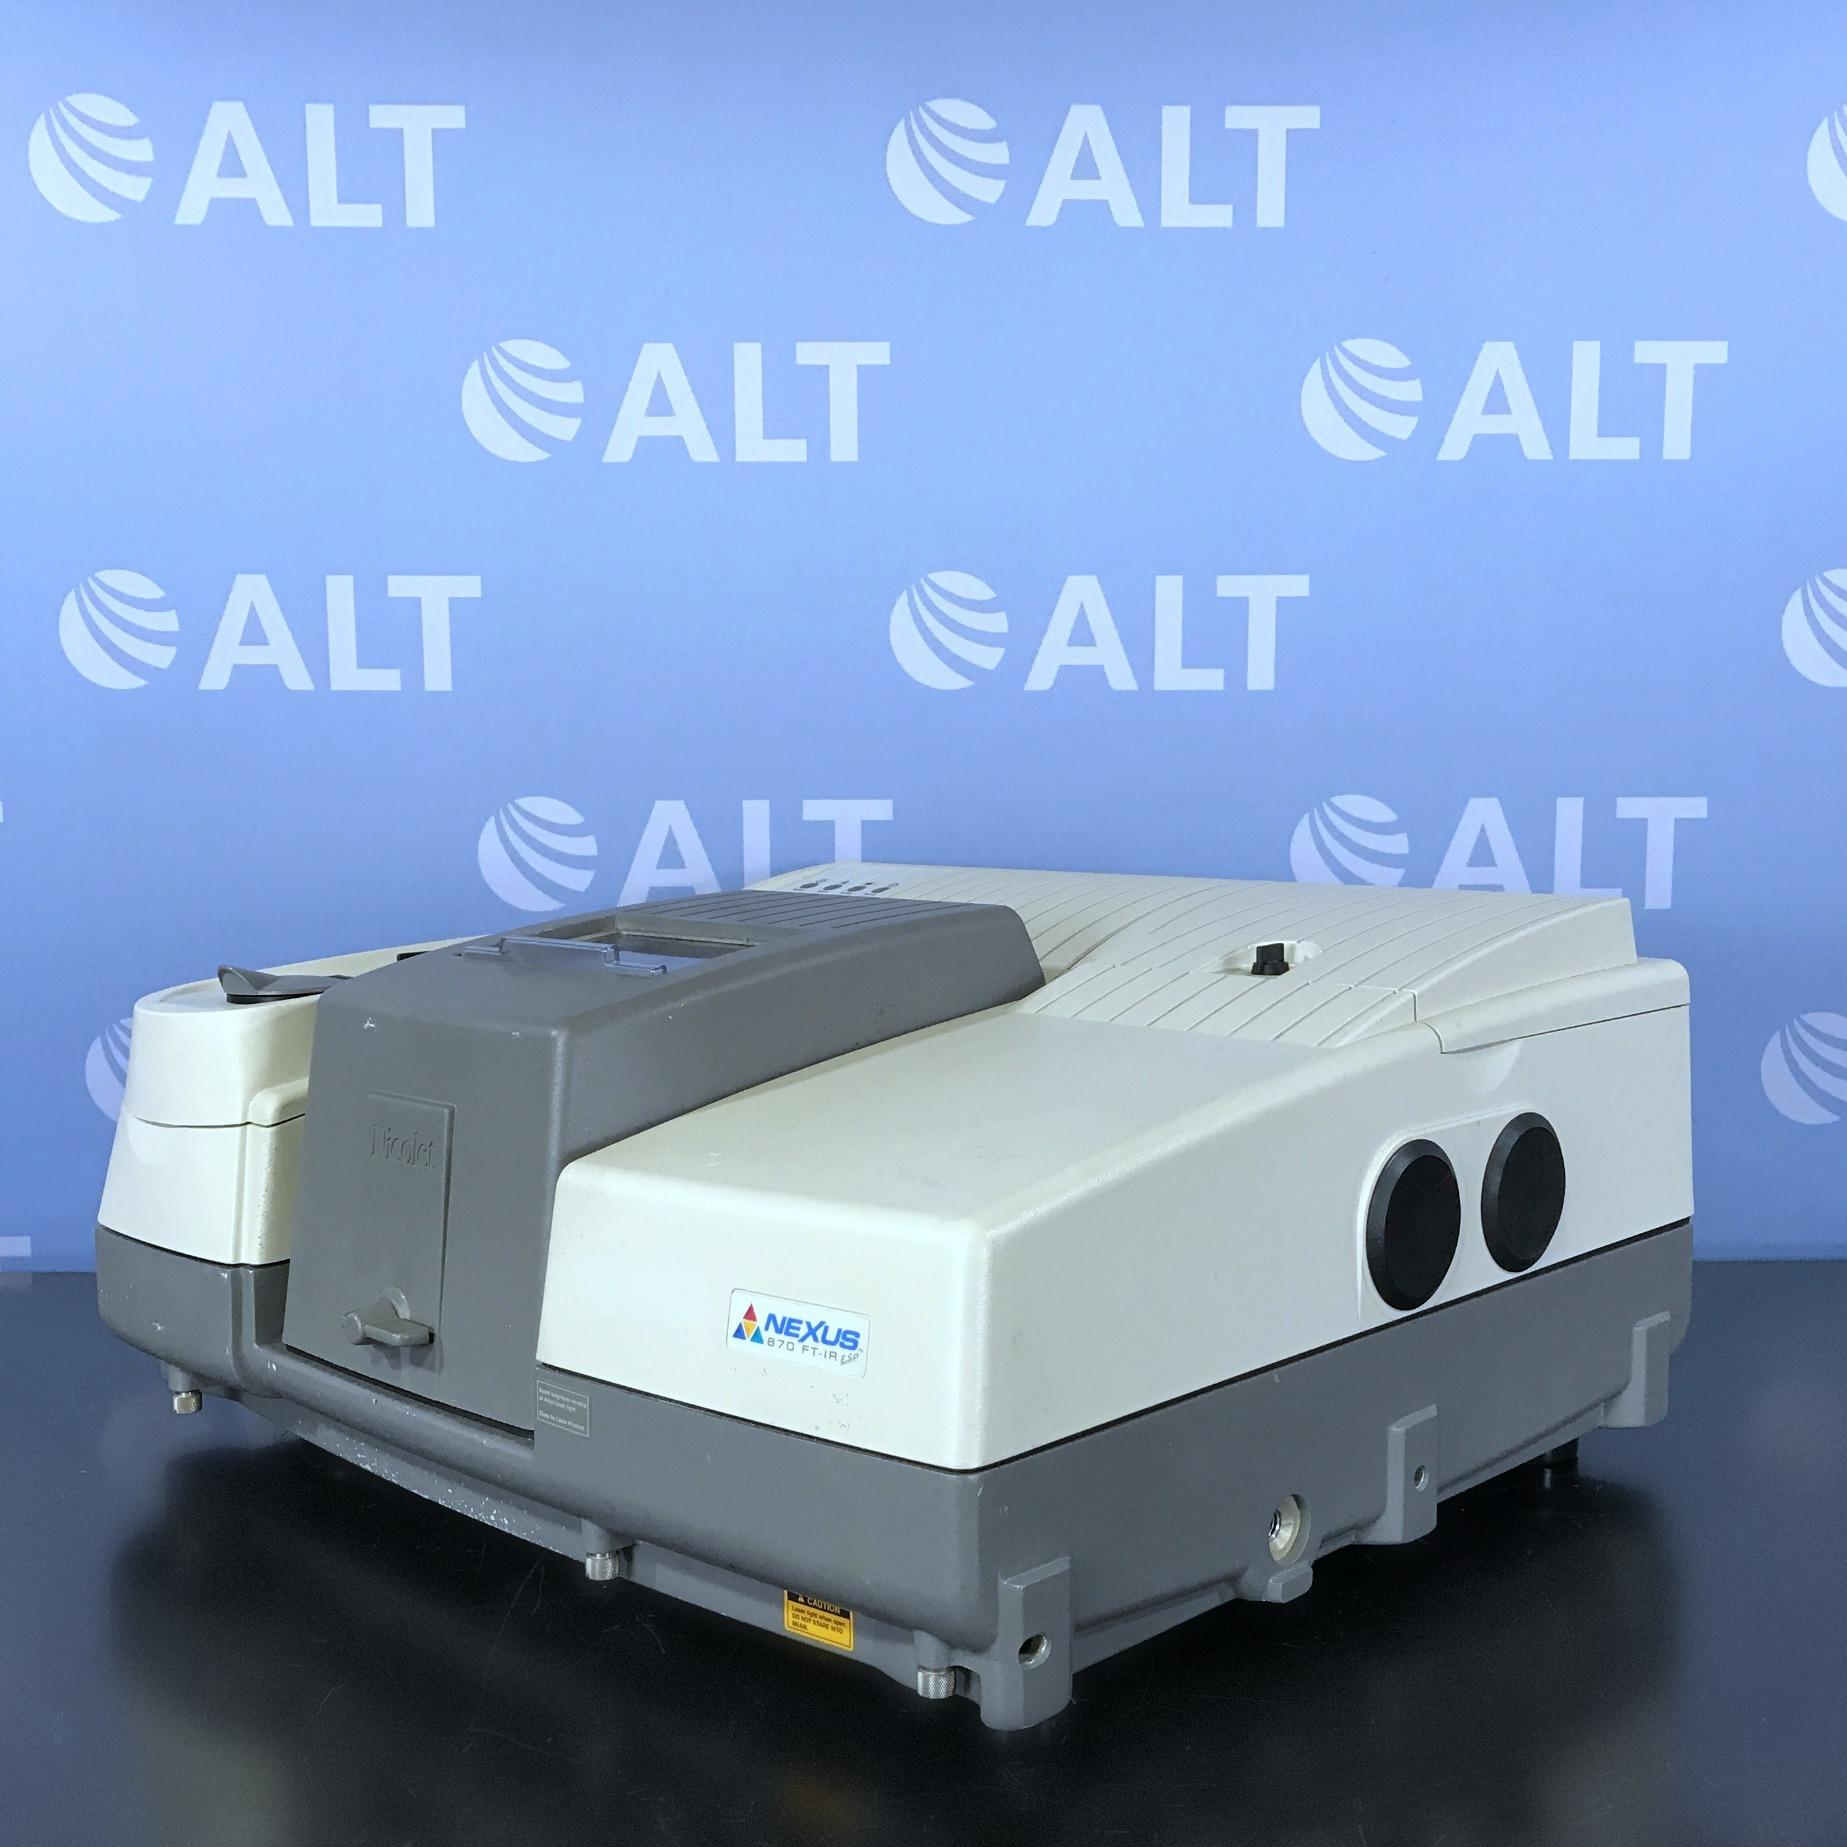 Thermo Nicolet NEXUS 670 FT-IR Spectrometer Image